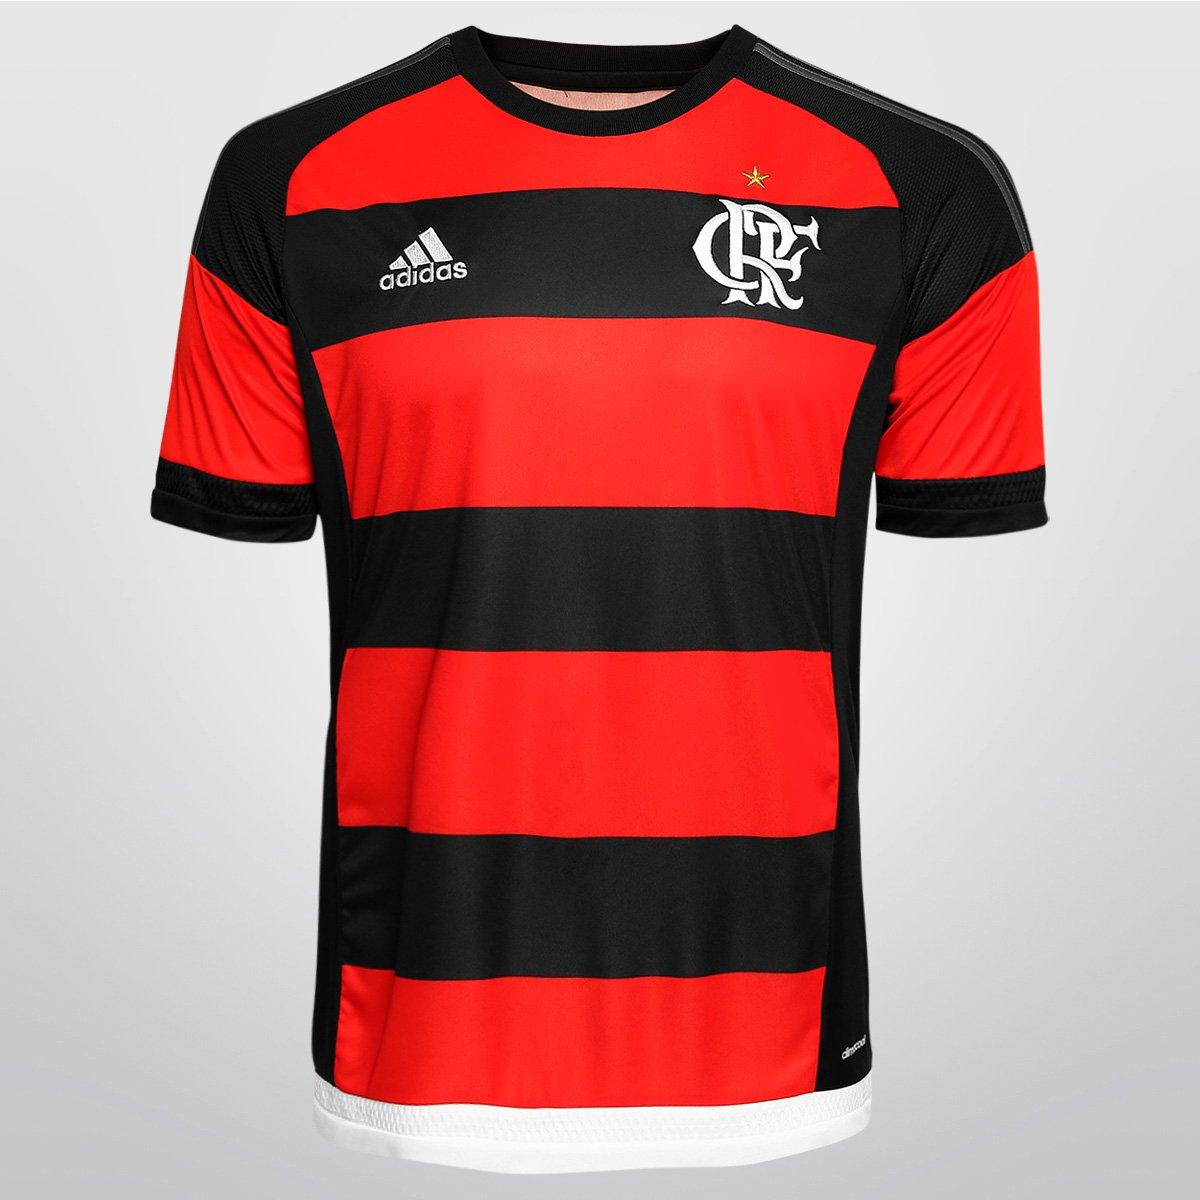 Camisa Adidas Flamengo I 15 16 s n° - Compre Agora  aa352fdd9af